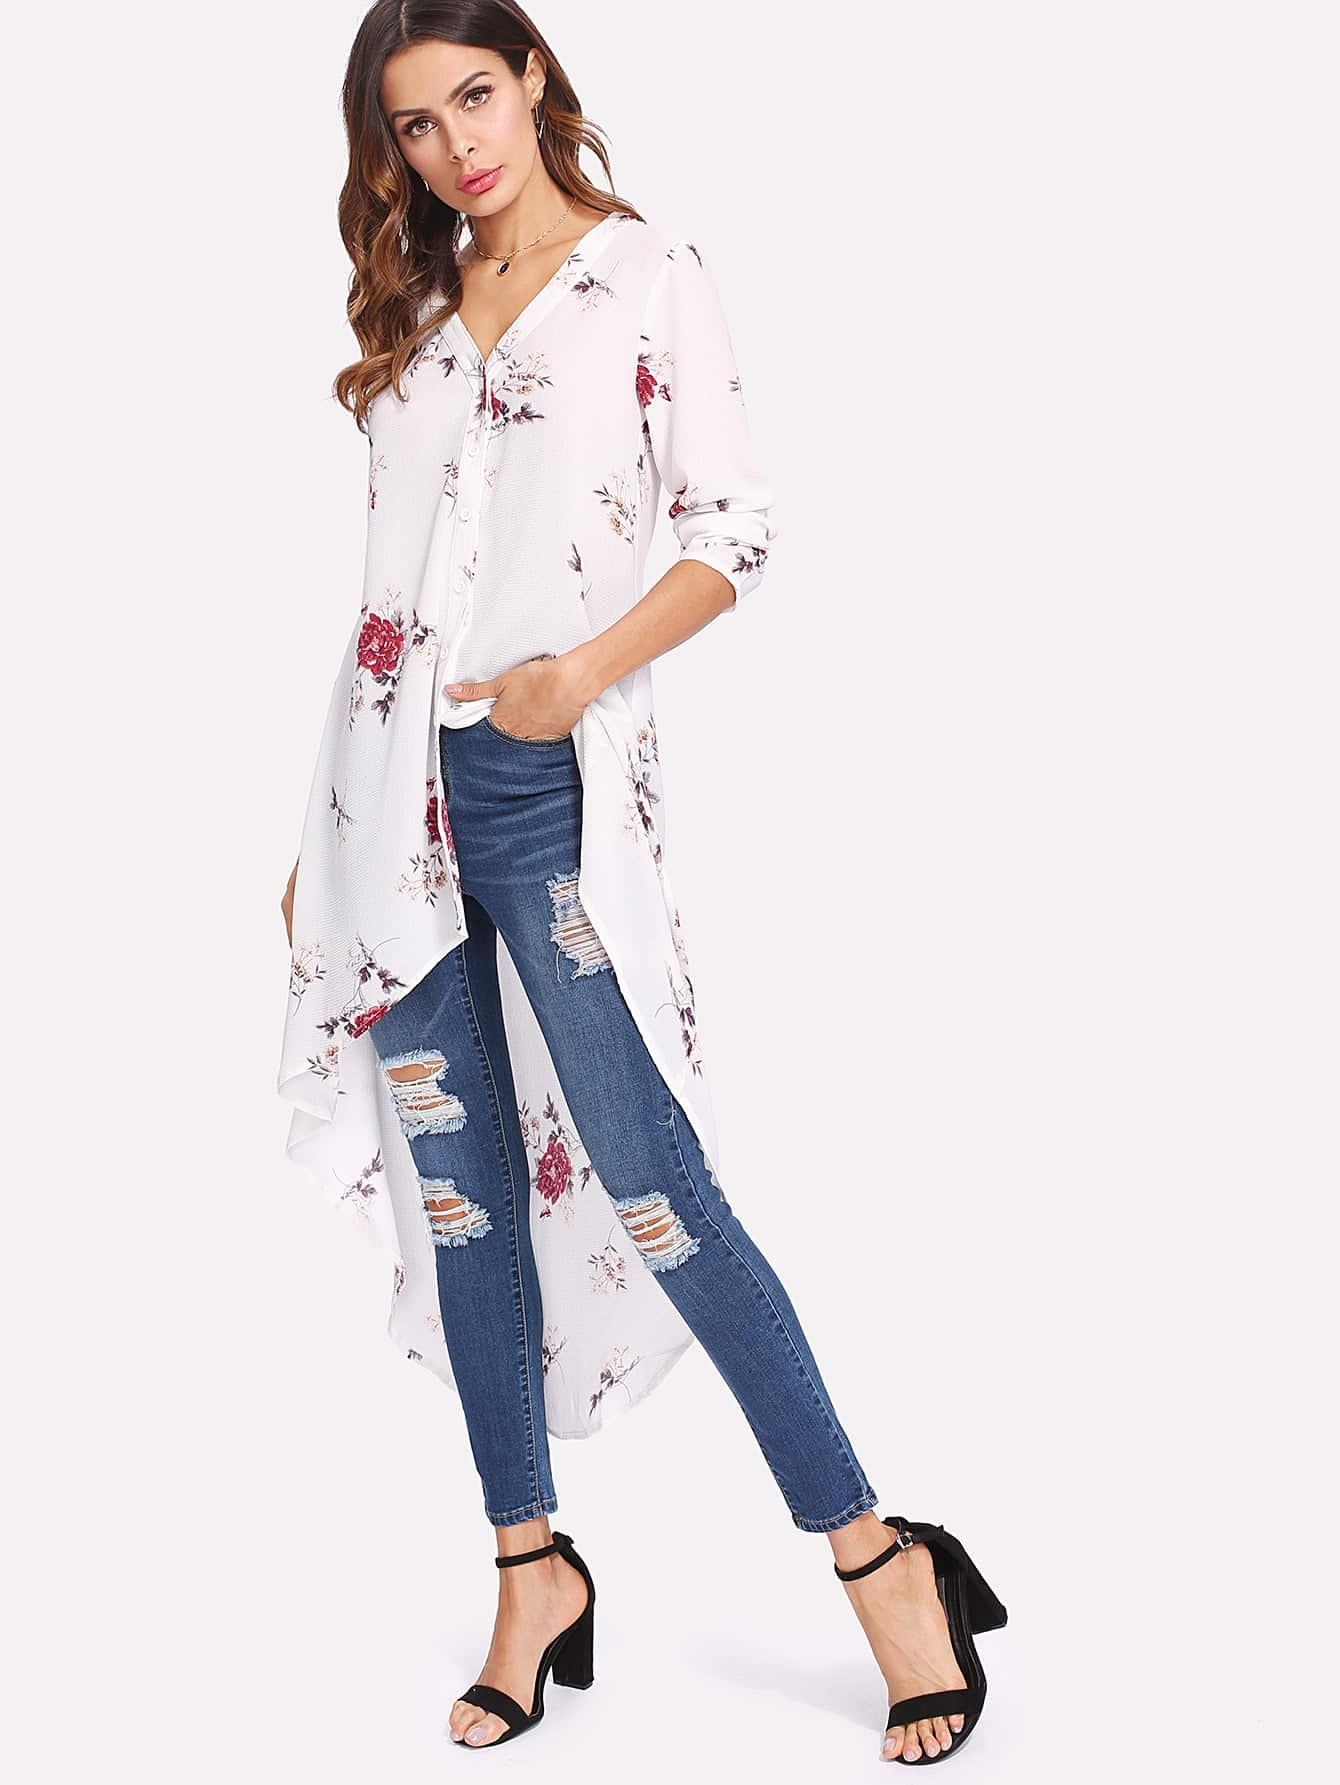 Botanical Print Dip Hem Shirt all over florals dip hem shirt